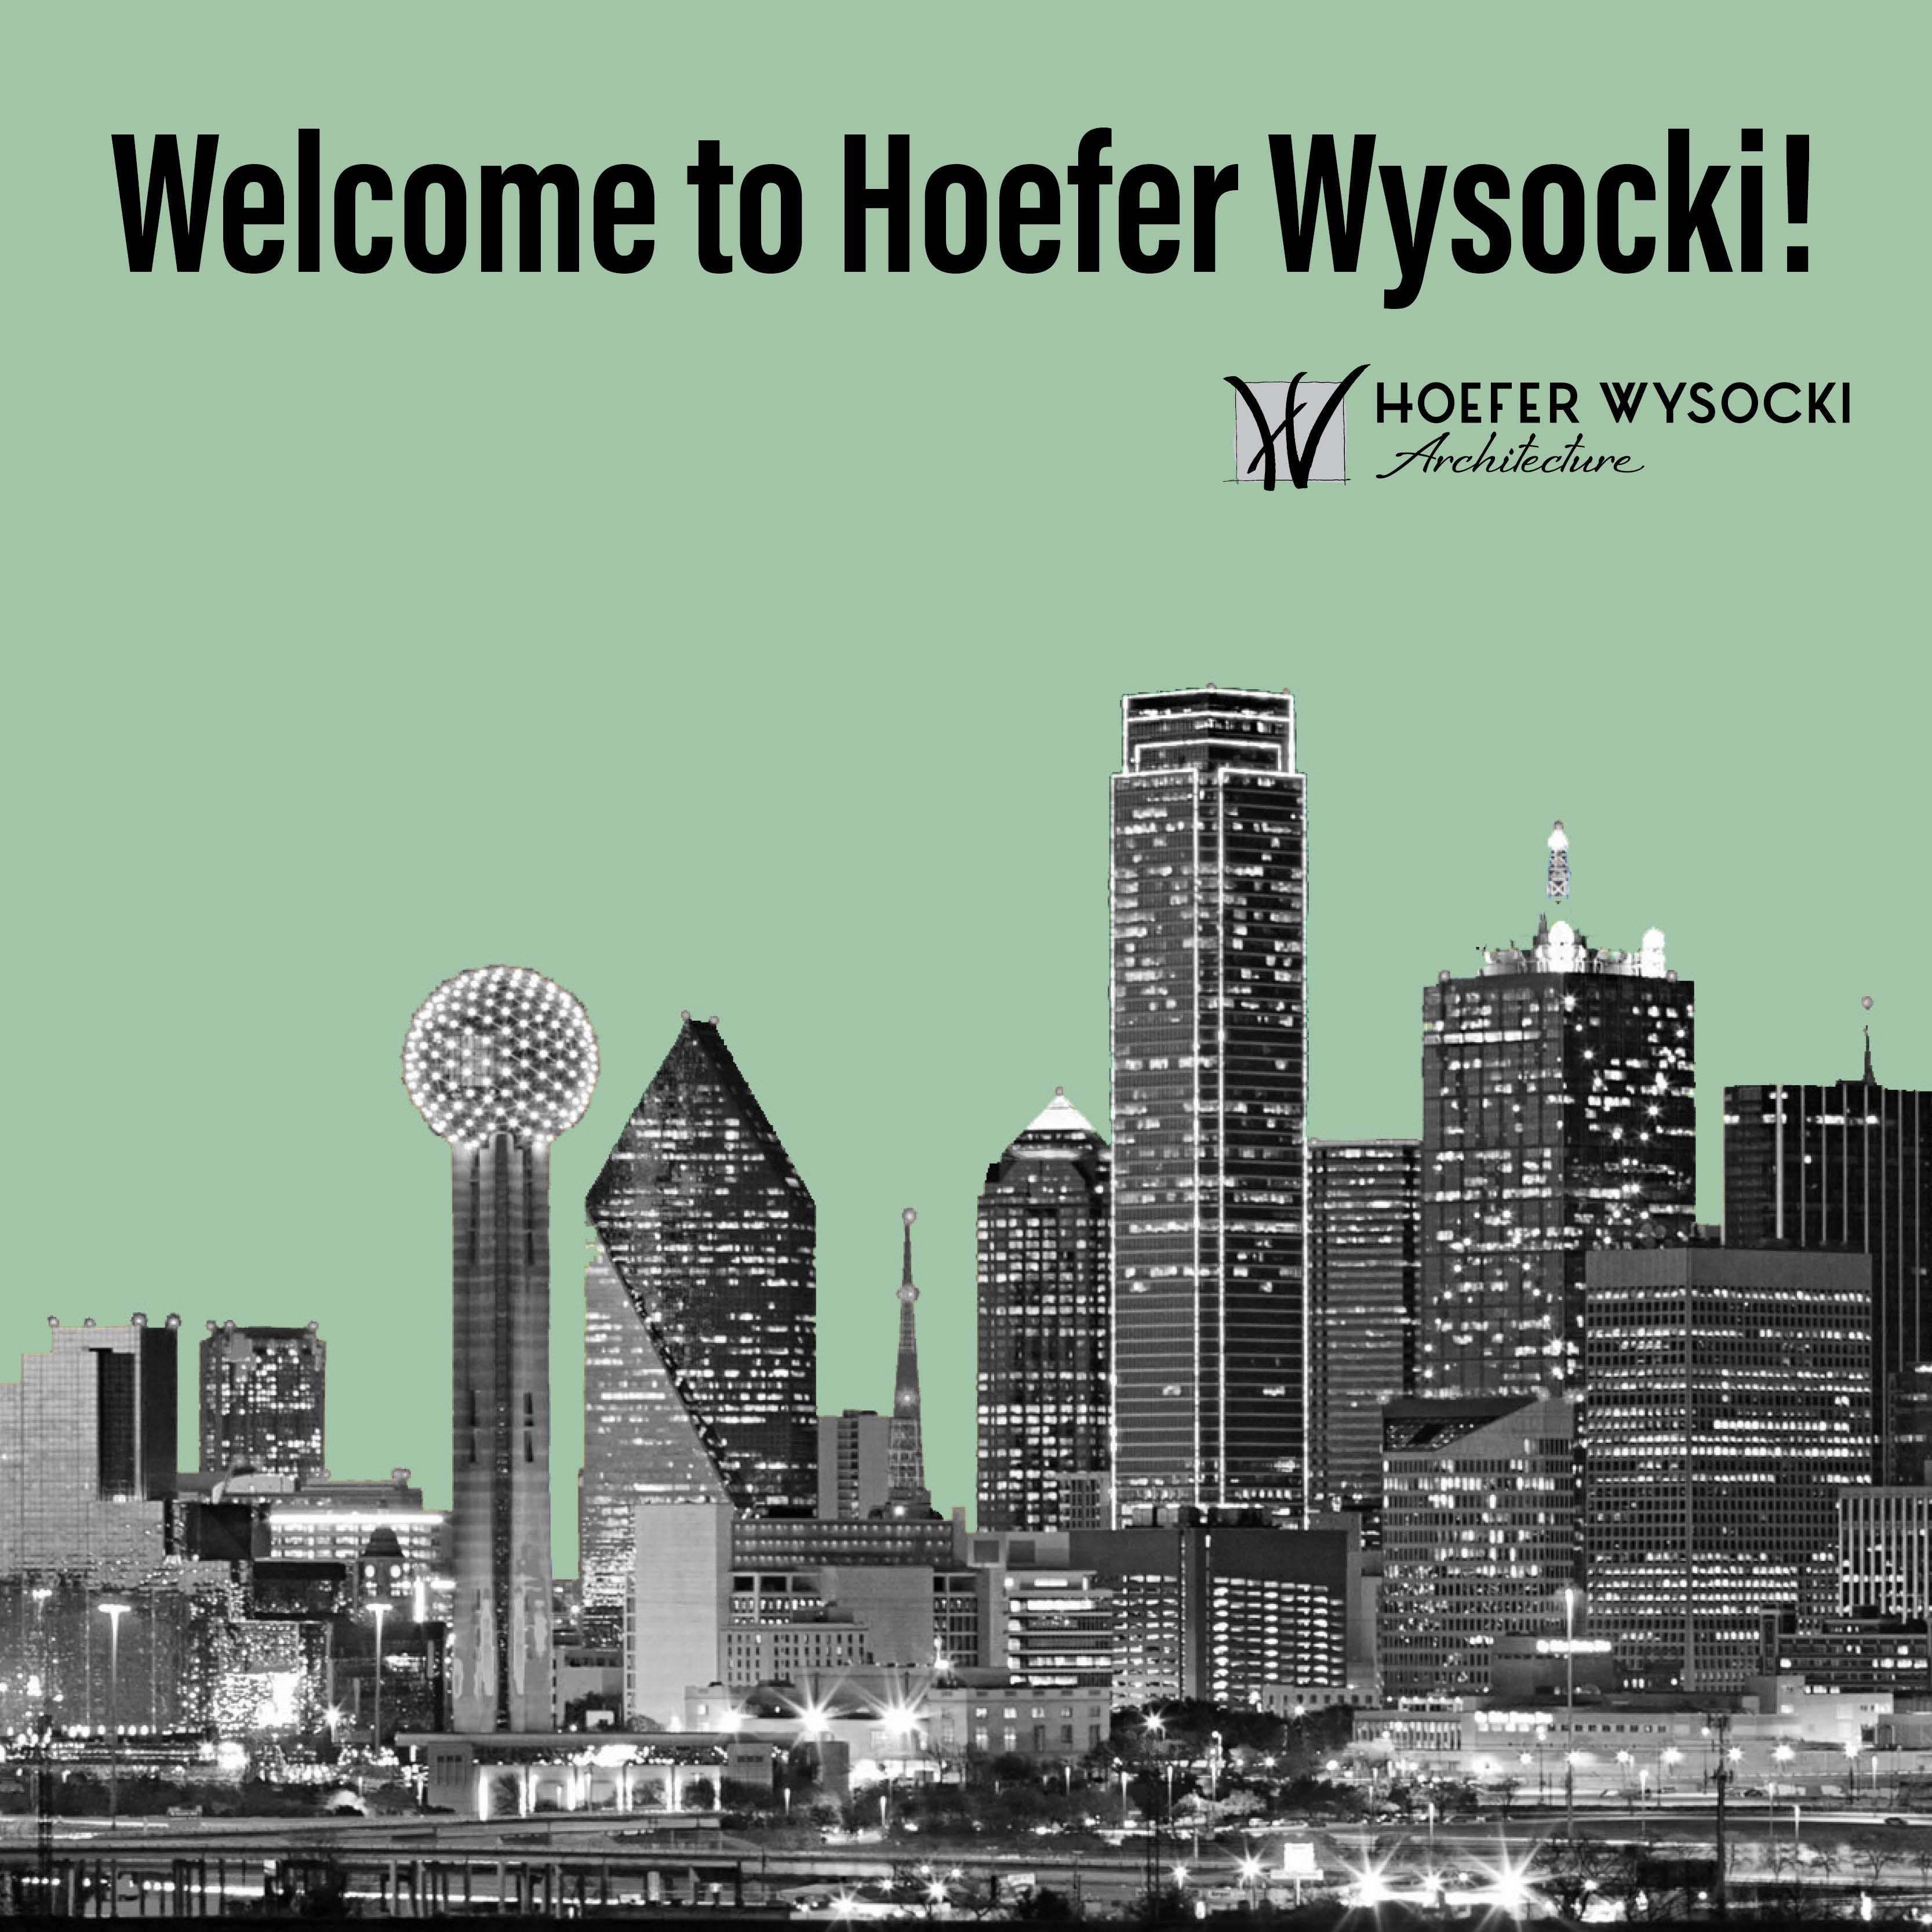 Welcoming Hoefer Wysocki's Summer Interns